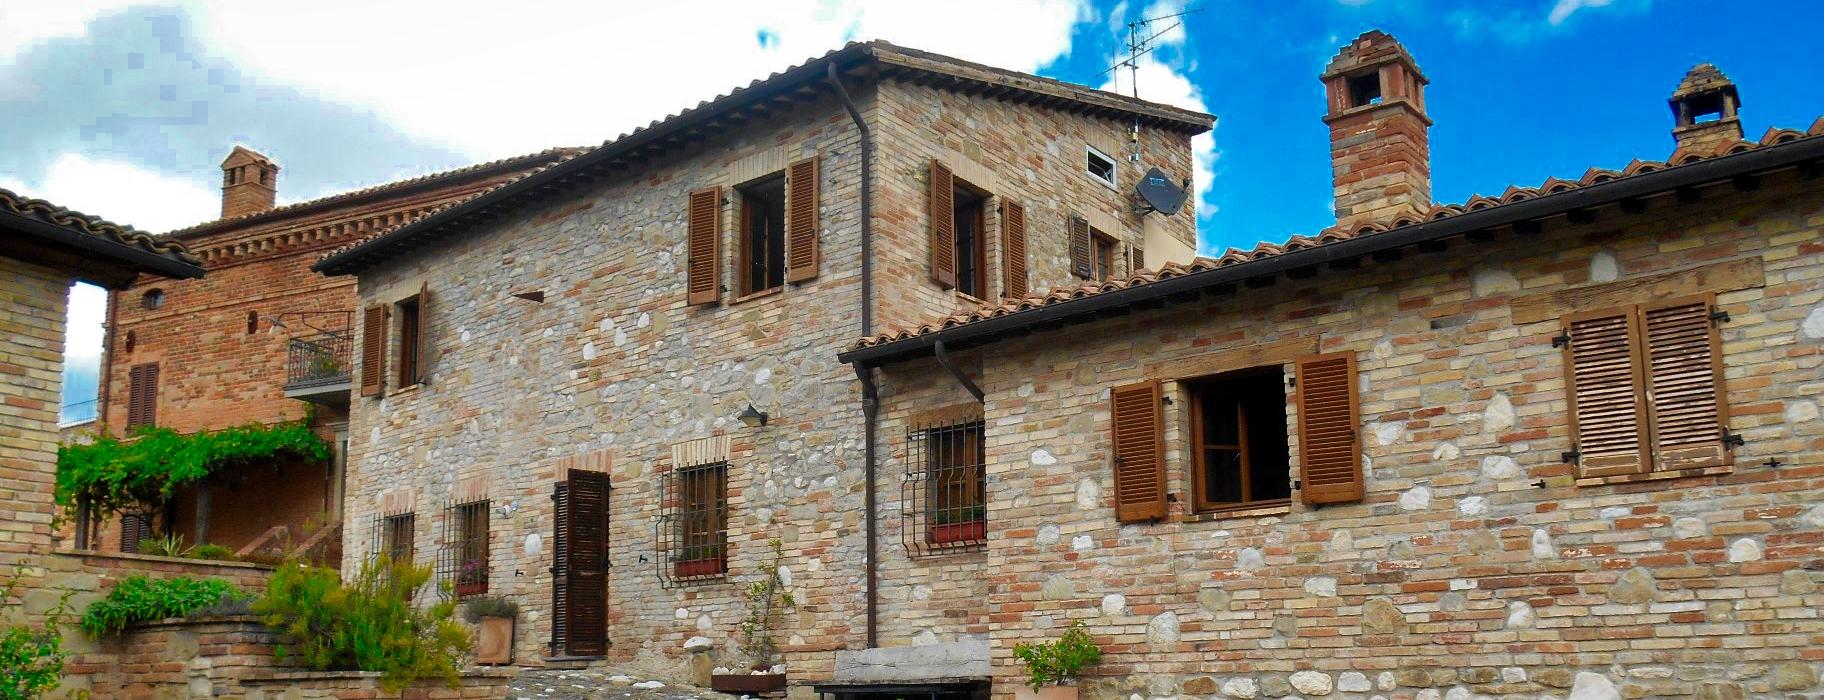 166 – Villa in campagna